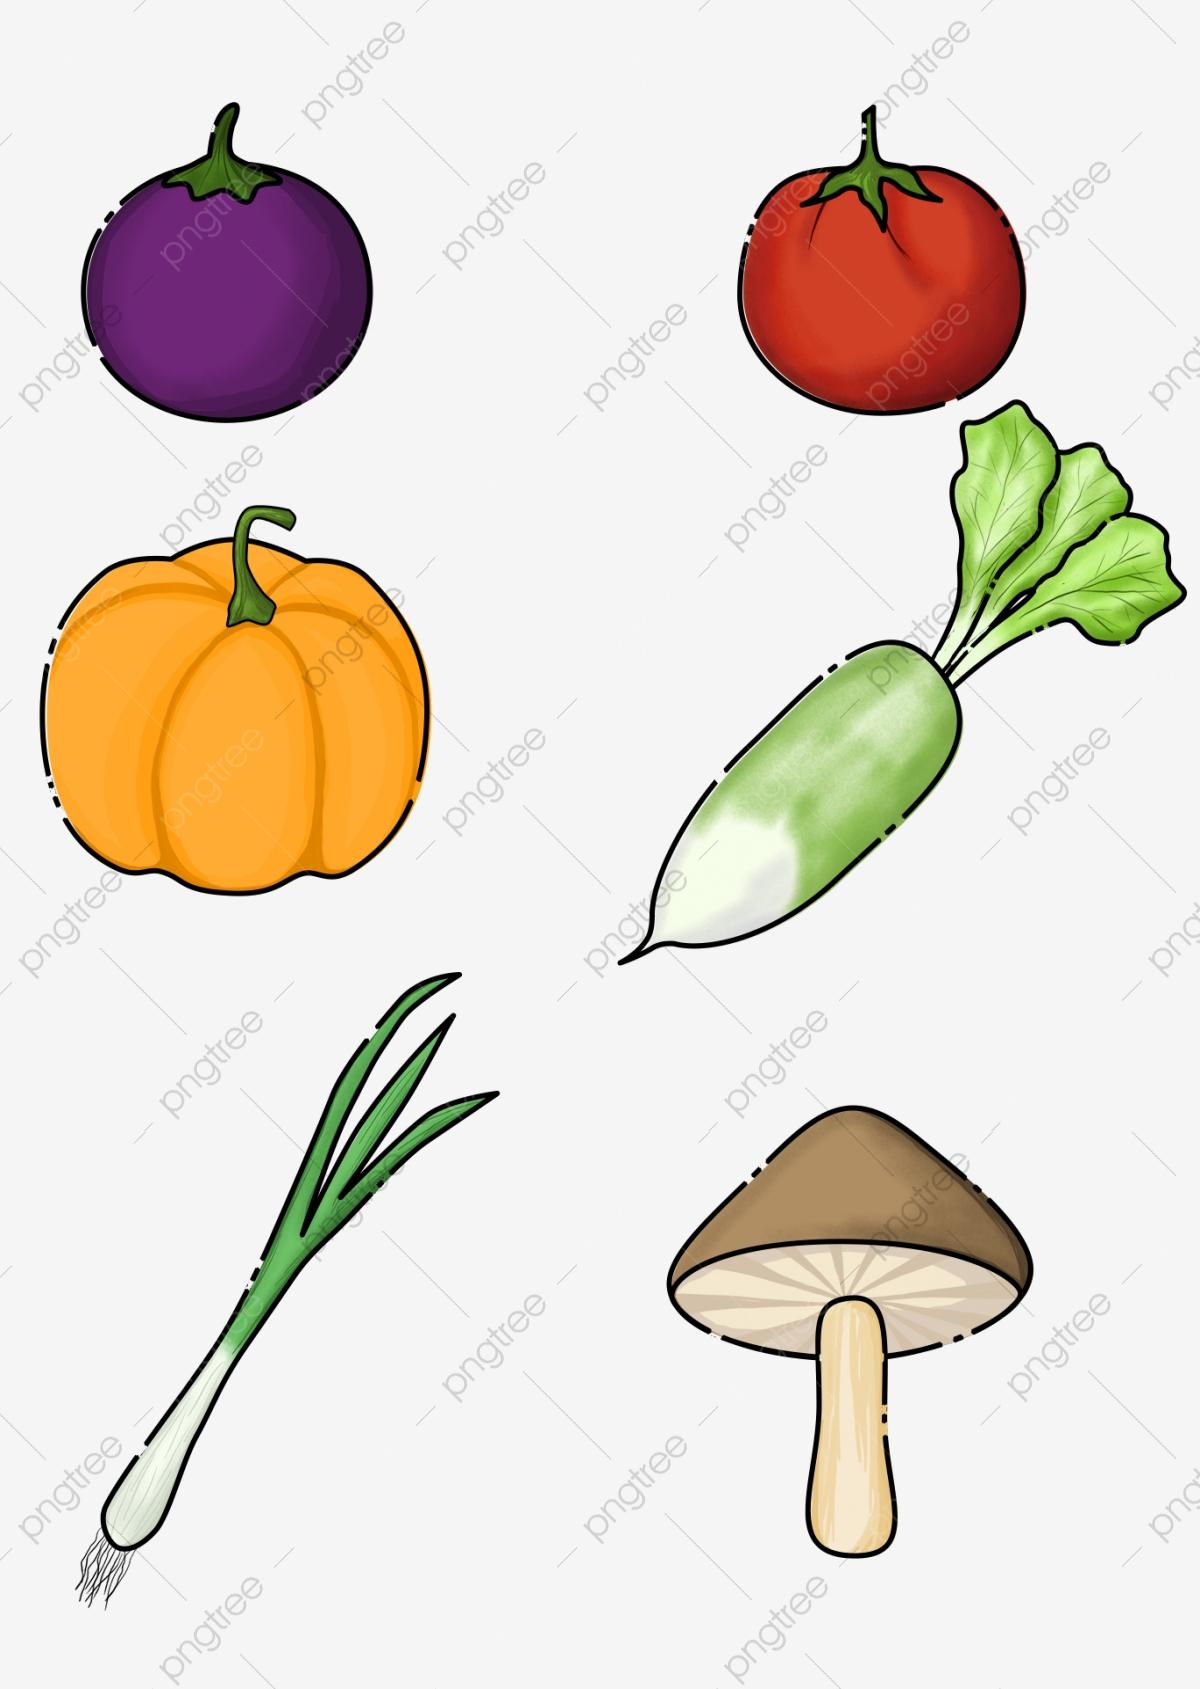 A Large Collection Of Vegetables, Vegetables Clipart, Vegetables.